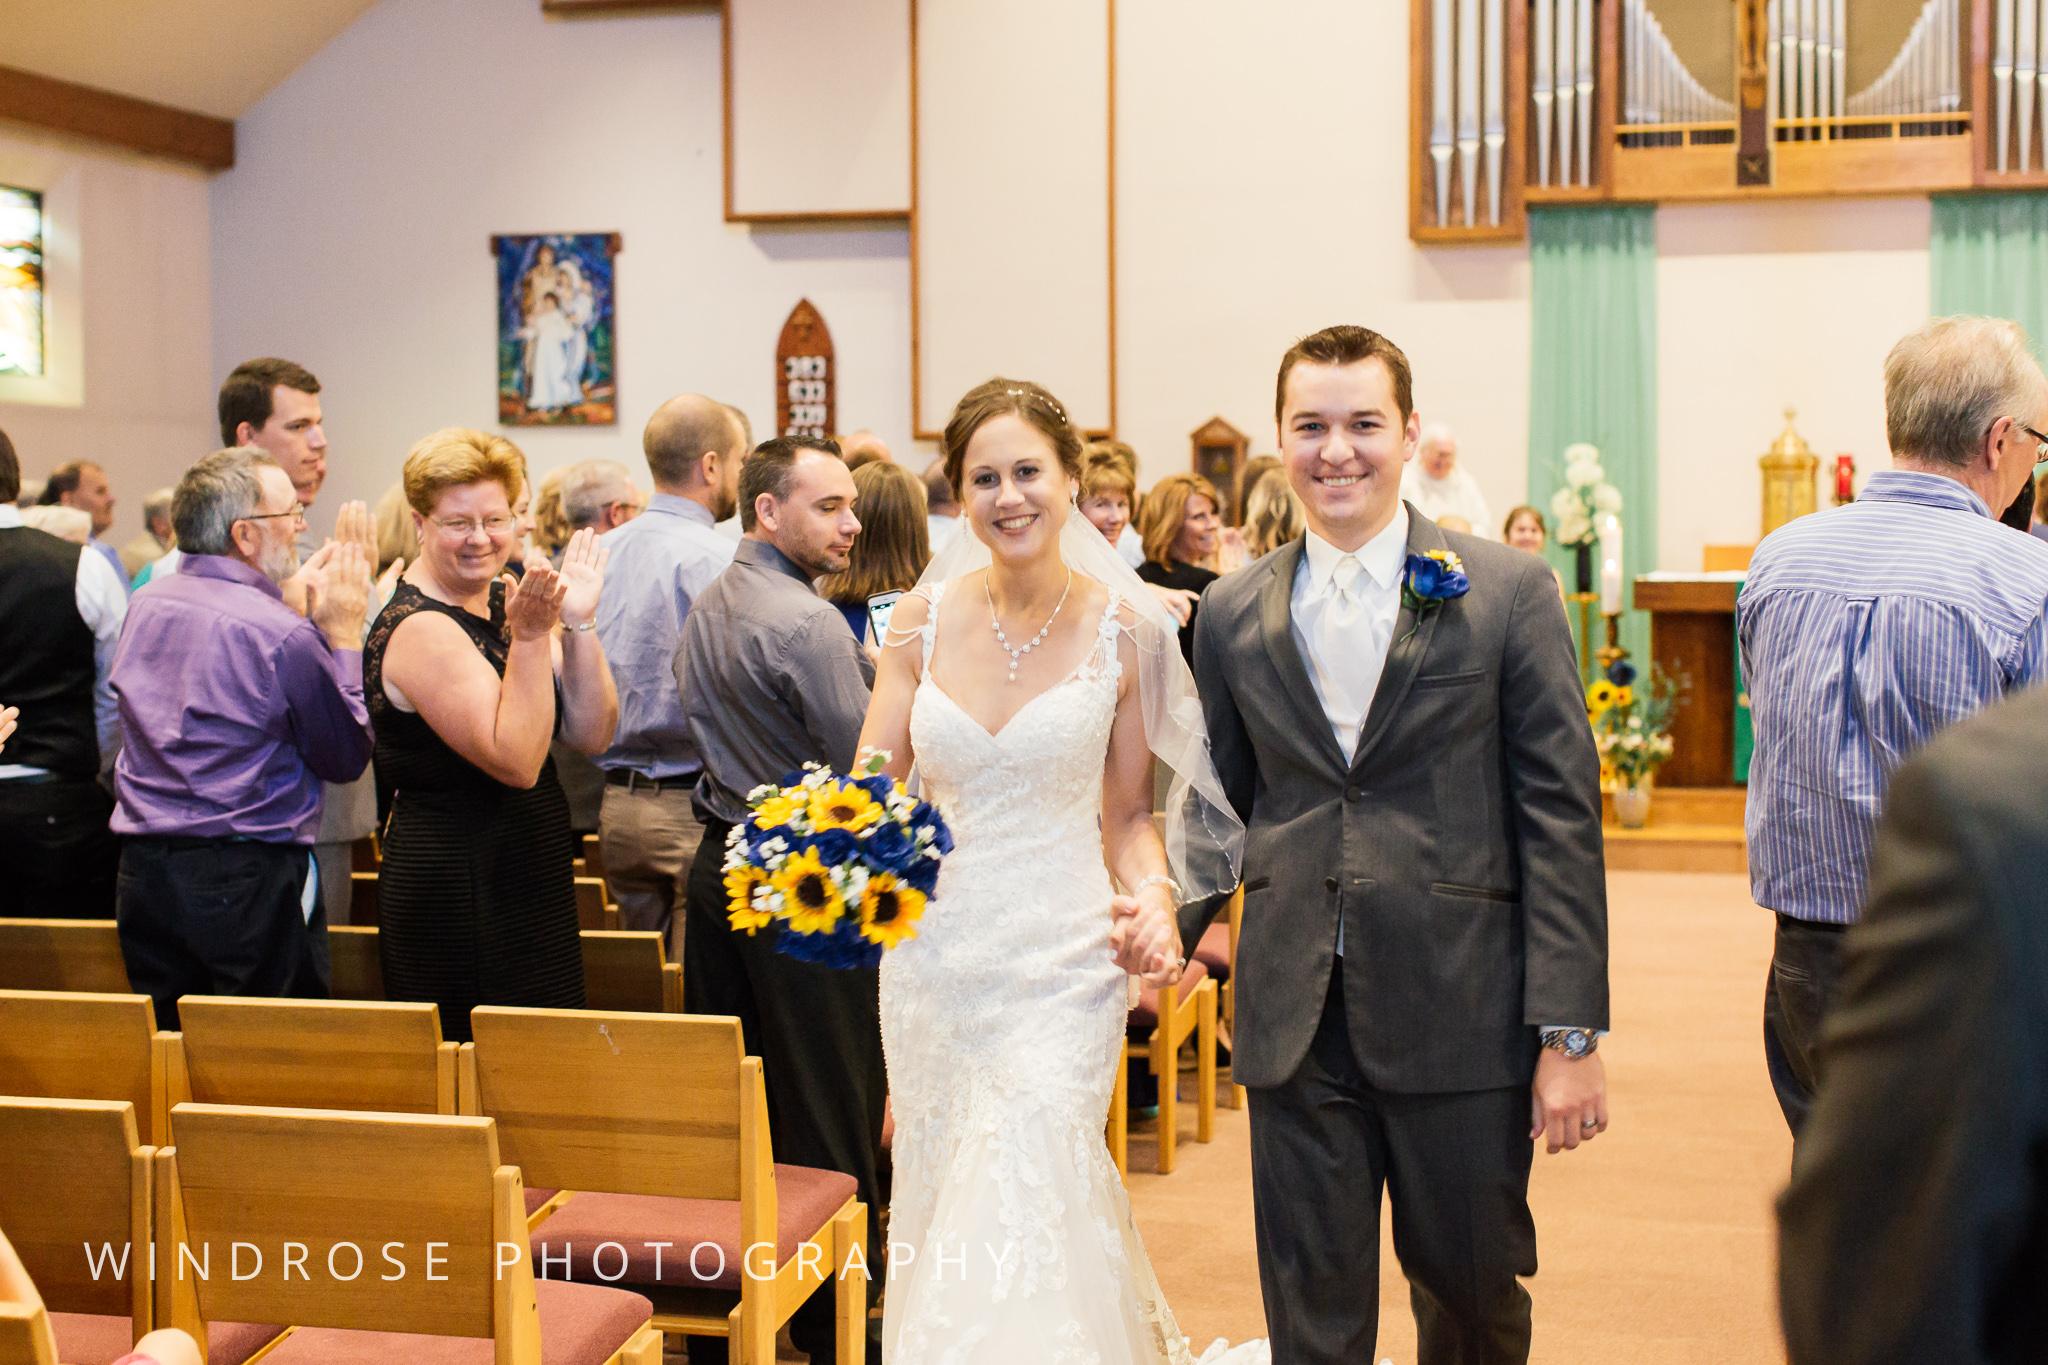 La-Crosse-Country-Club-Wedding-Minnesota-Wedding-Photographer-23.jpg